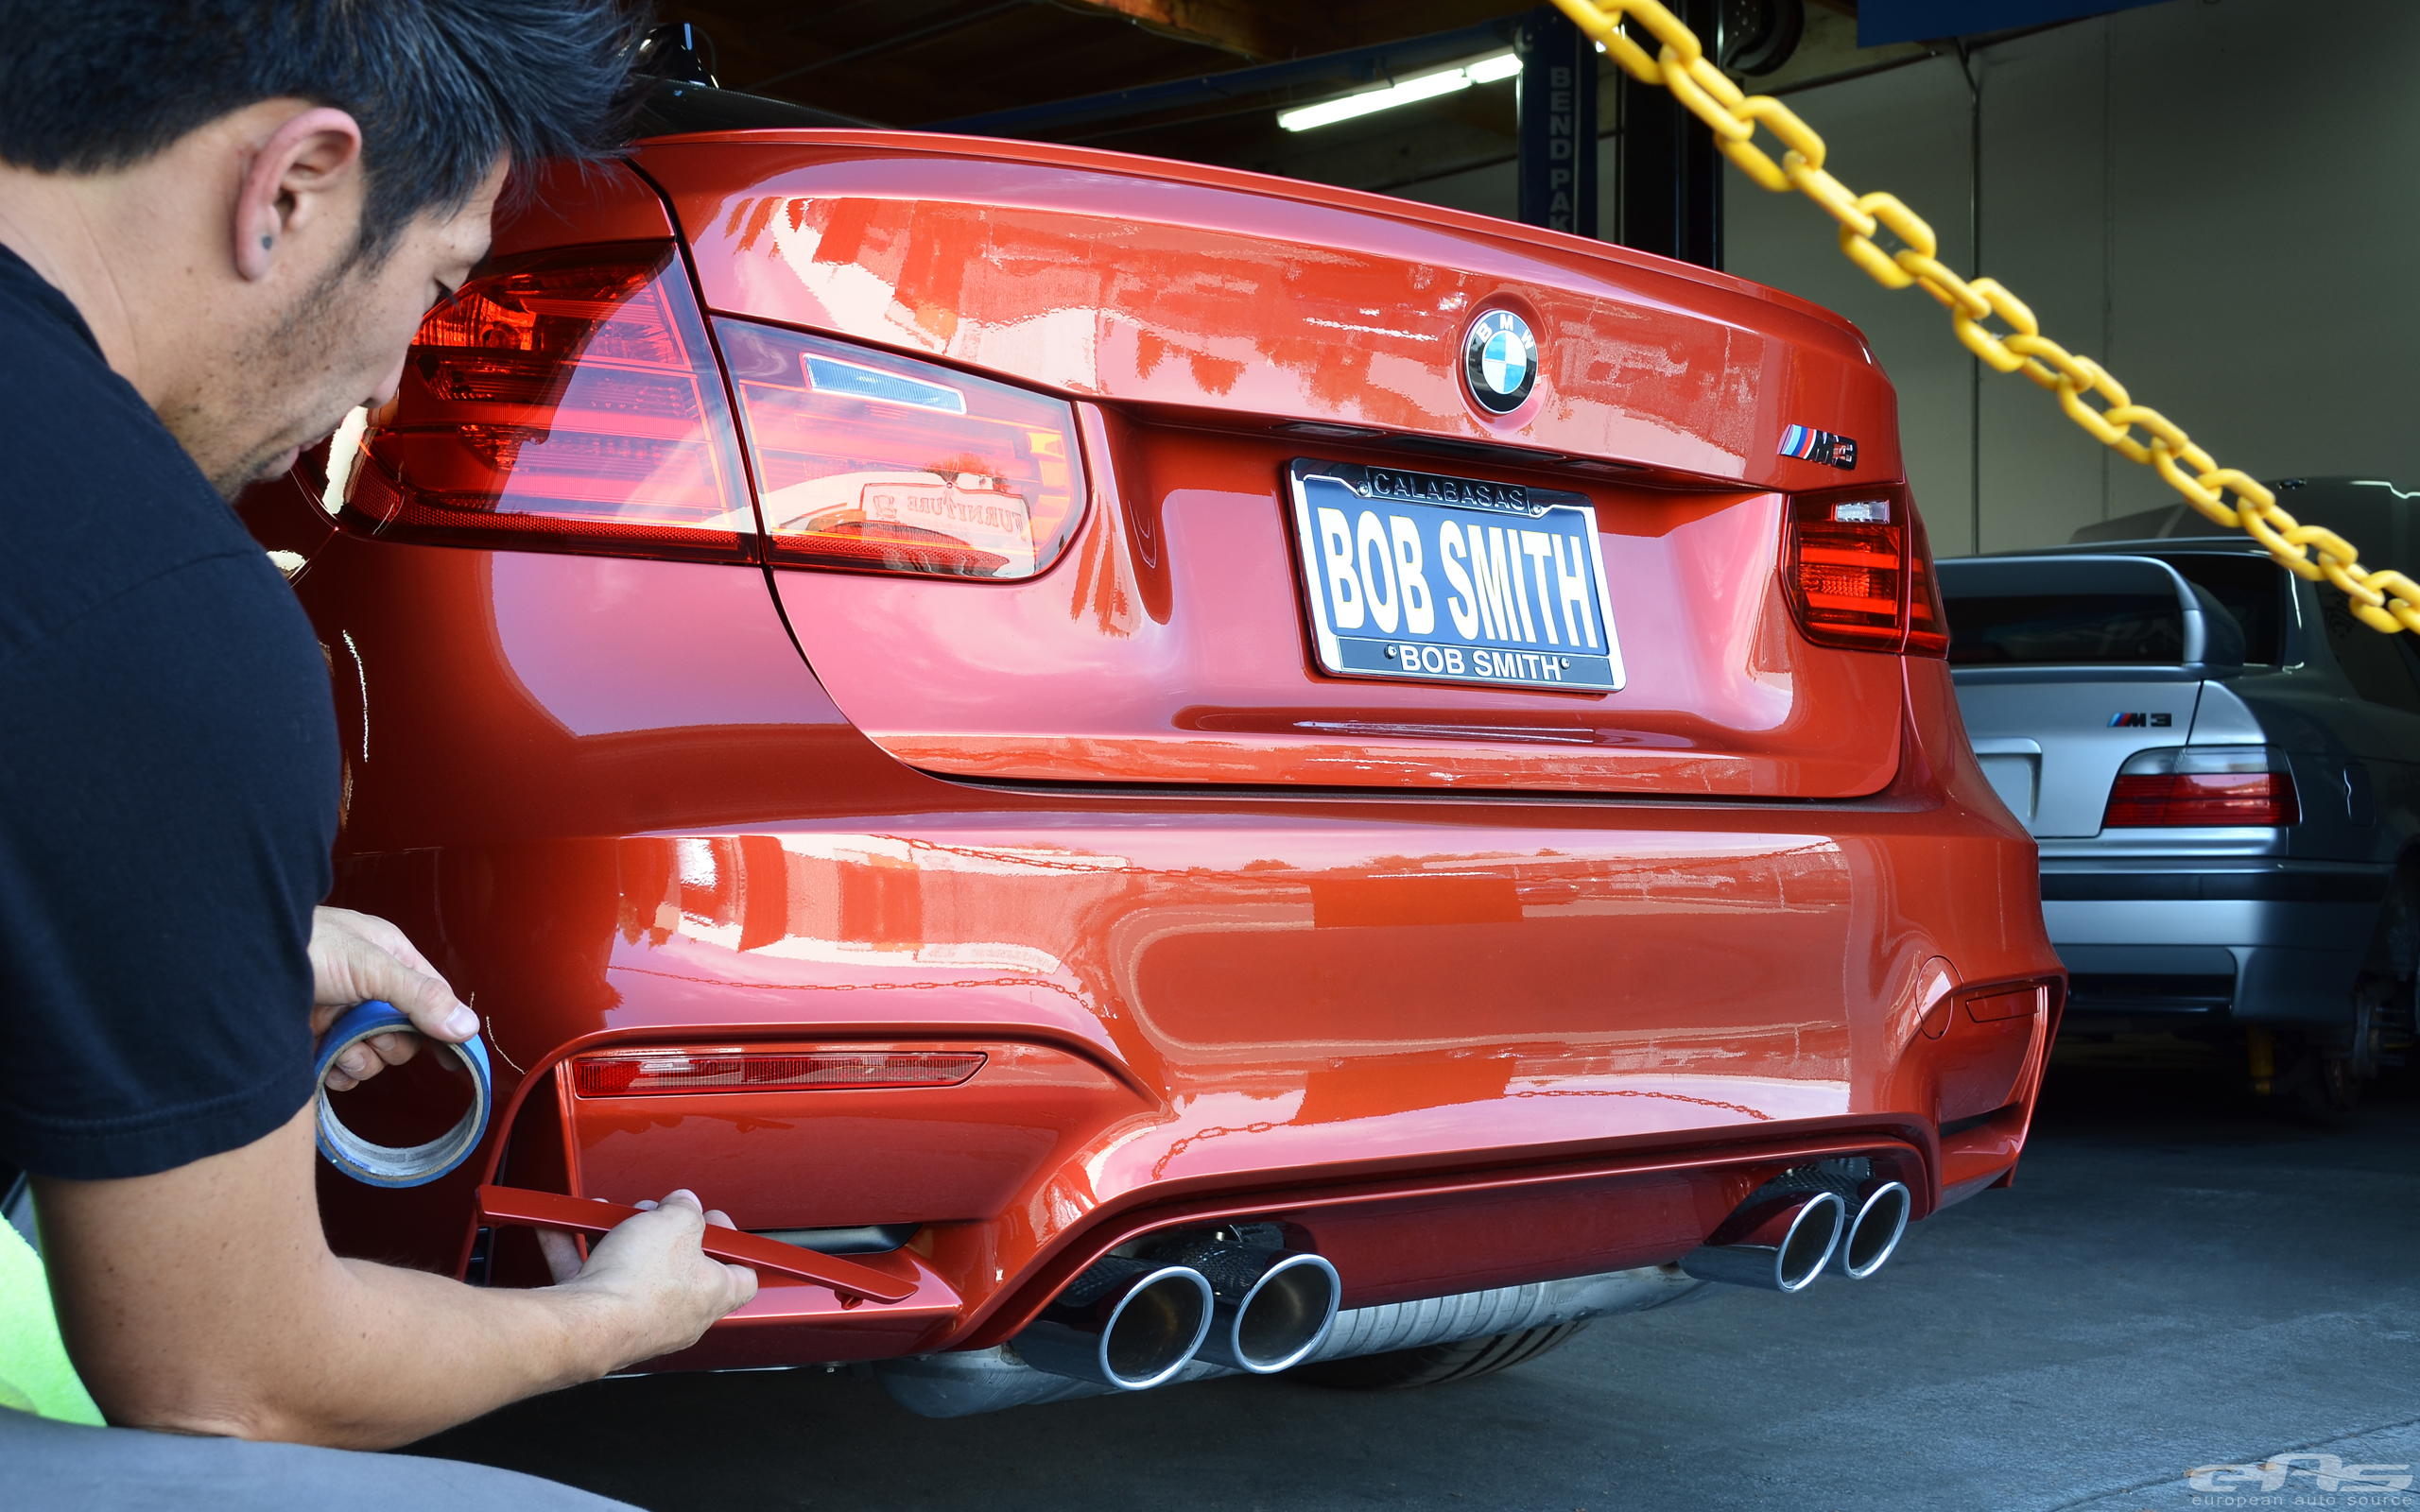 Sakhir Orange F80 M3 | BMW Performance Parts & Services